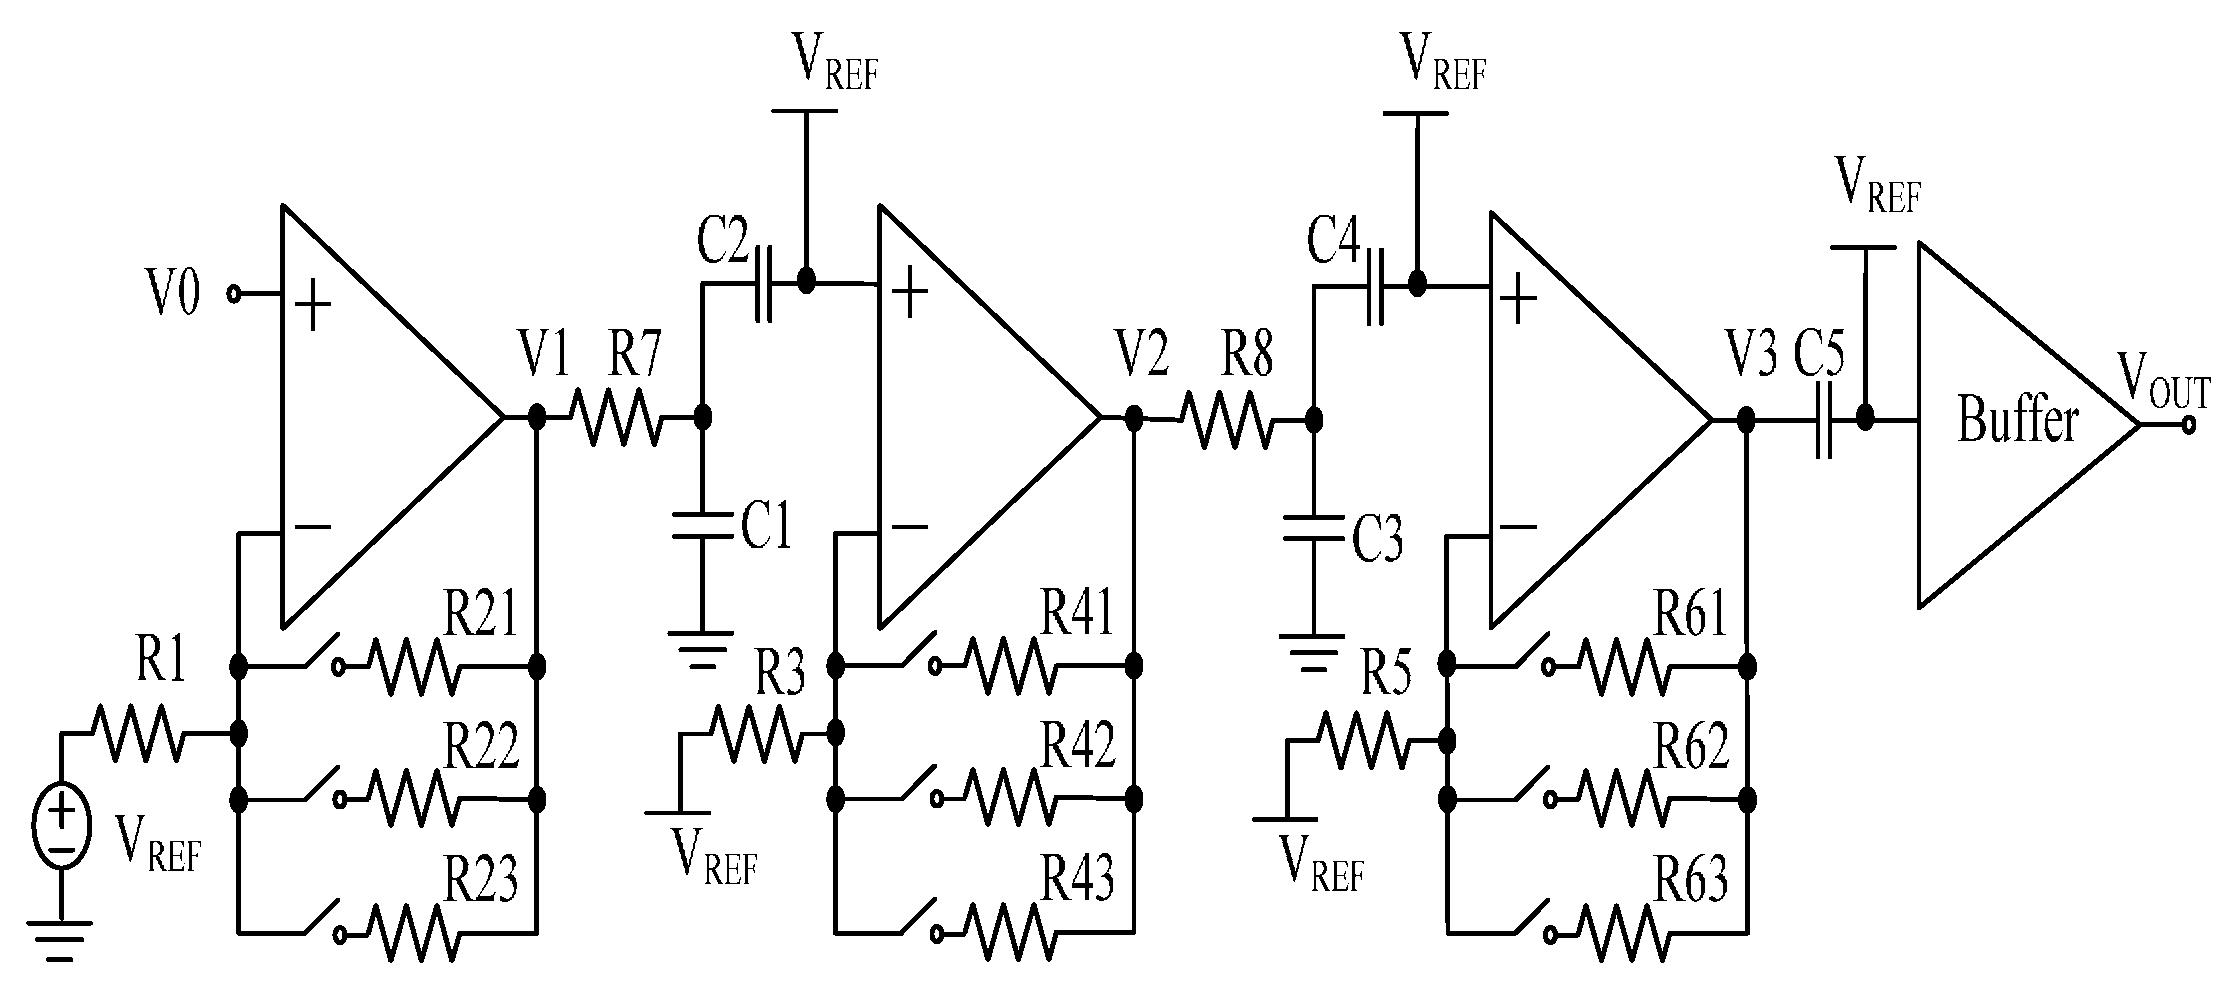 sim card reader circuit diagram 2016 taotao 50cc wiring sensors free full text low power near field